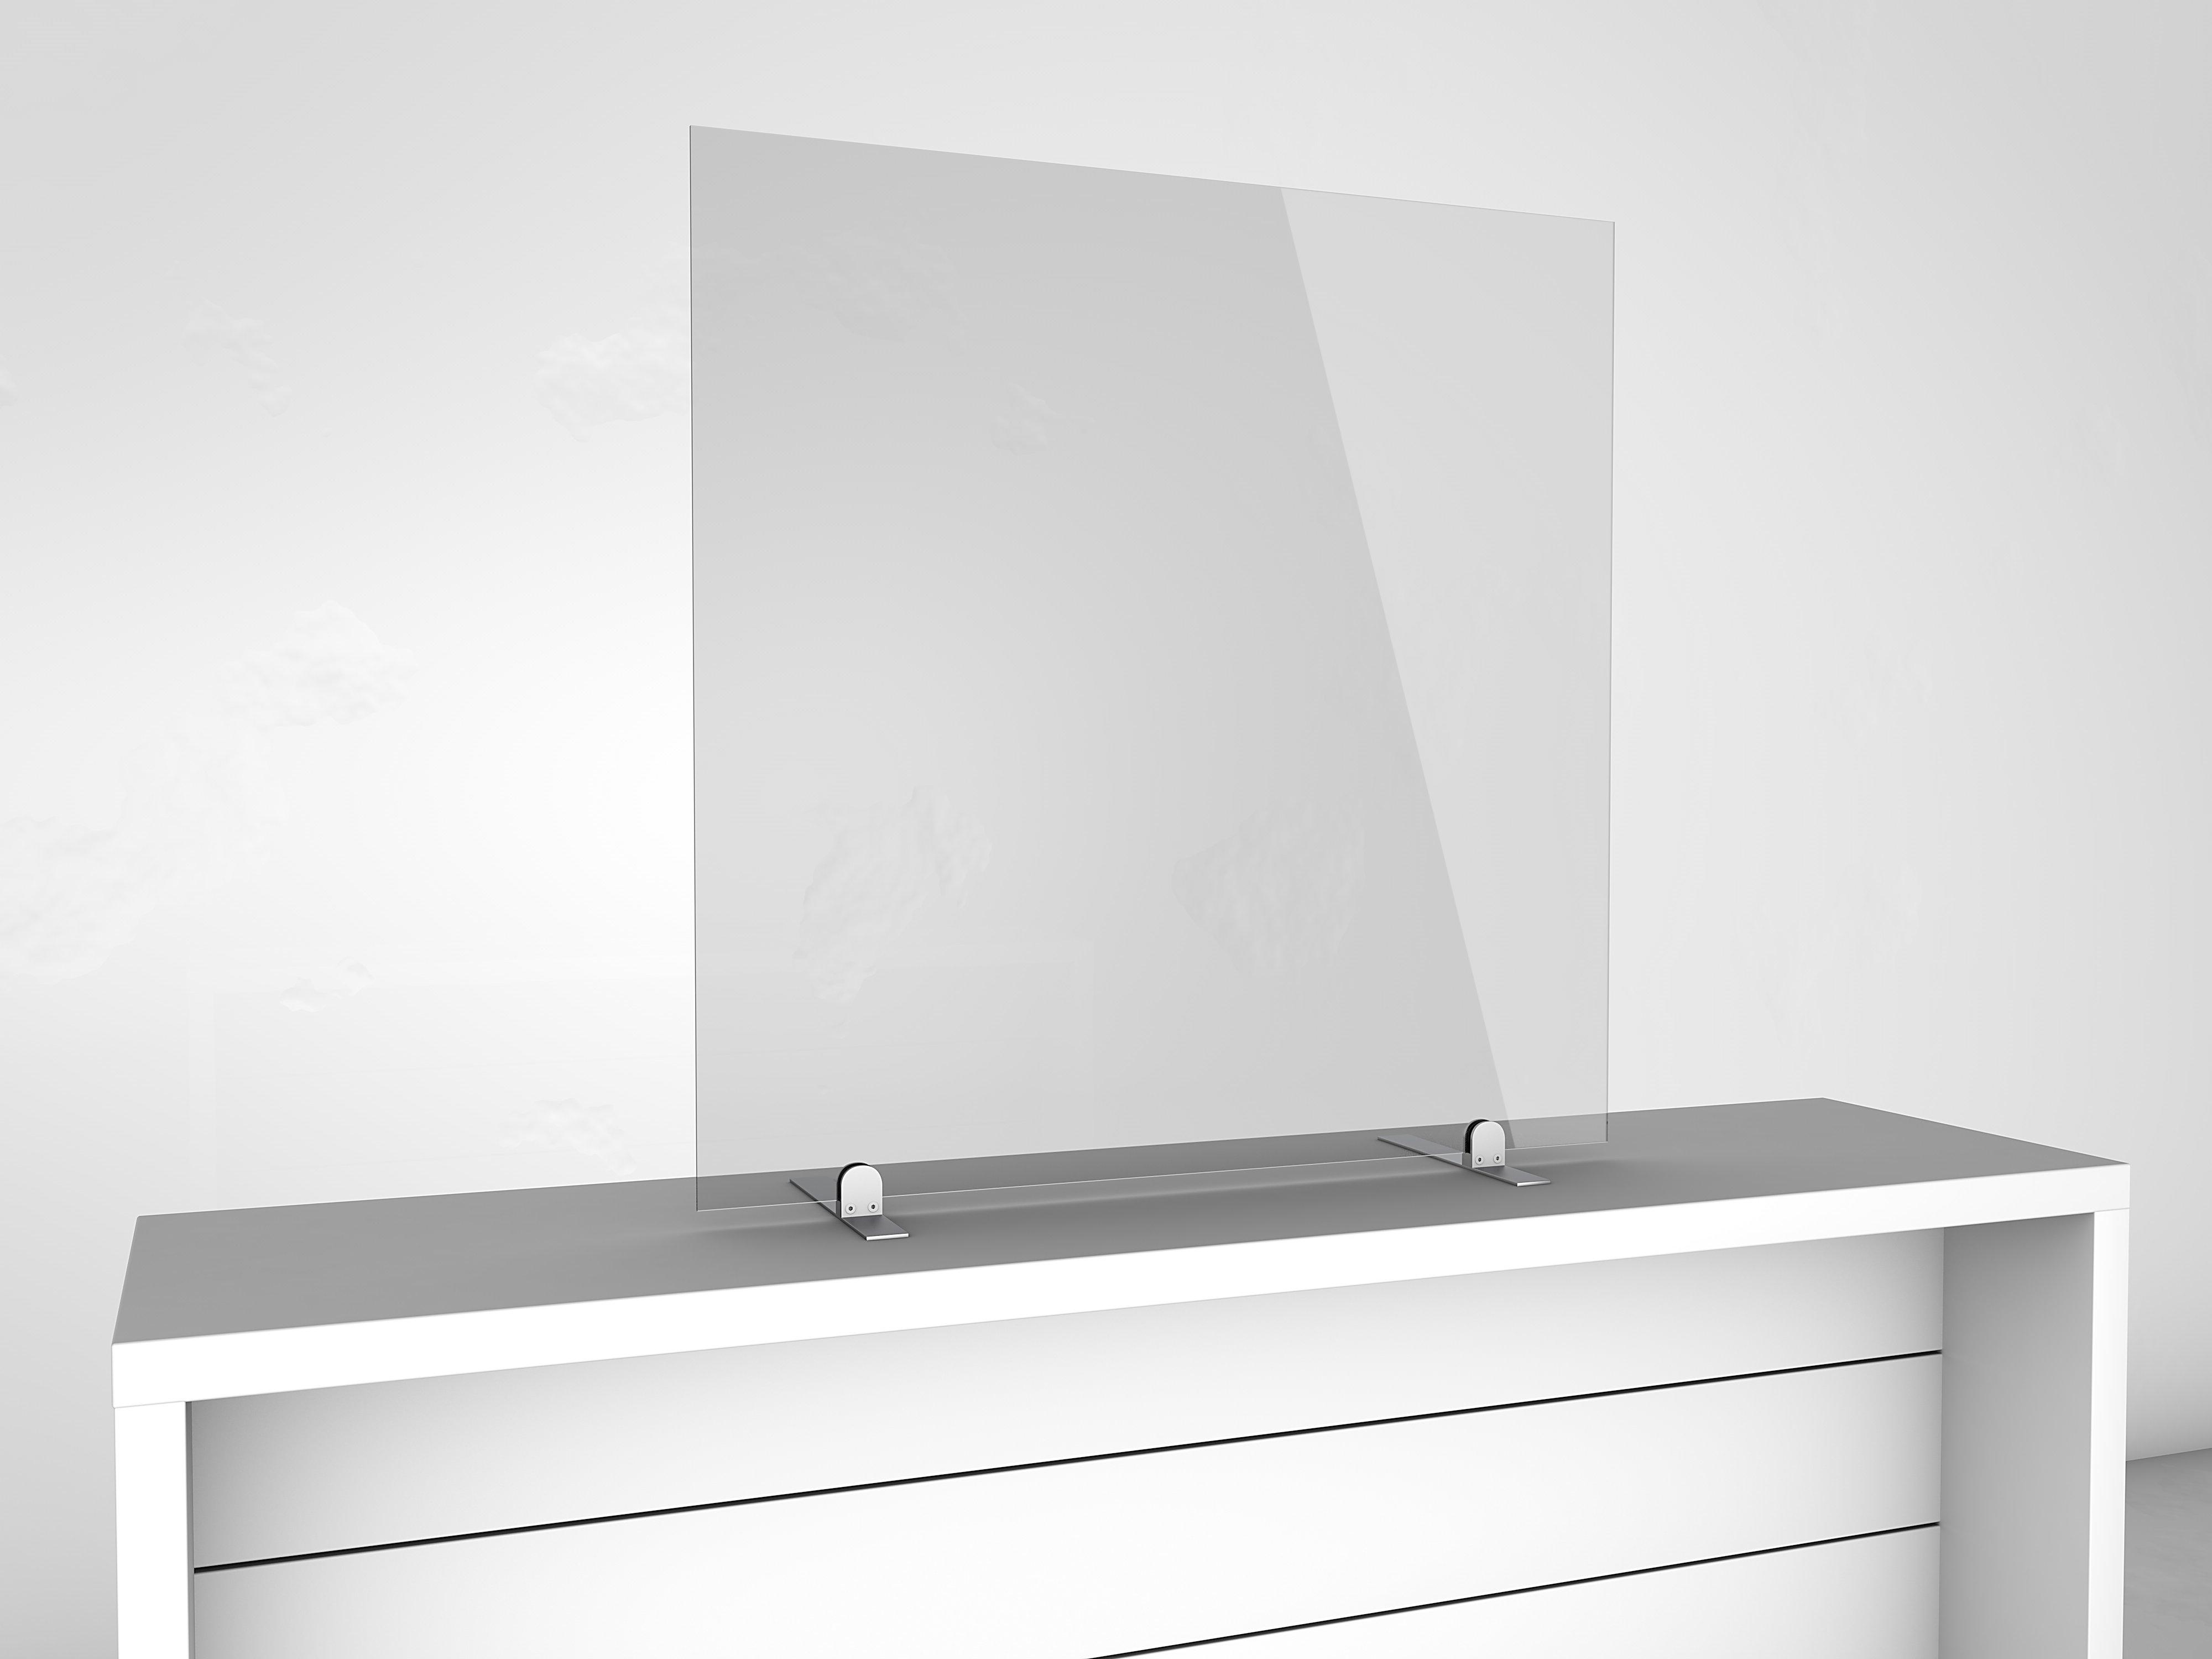 Gutta Spuckschutzwand Premium 1000 x 1000 x 6 mm